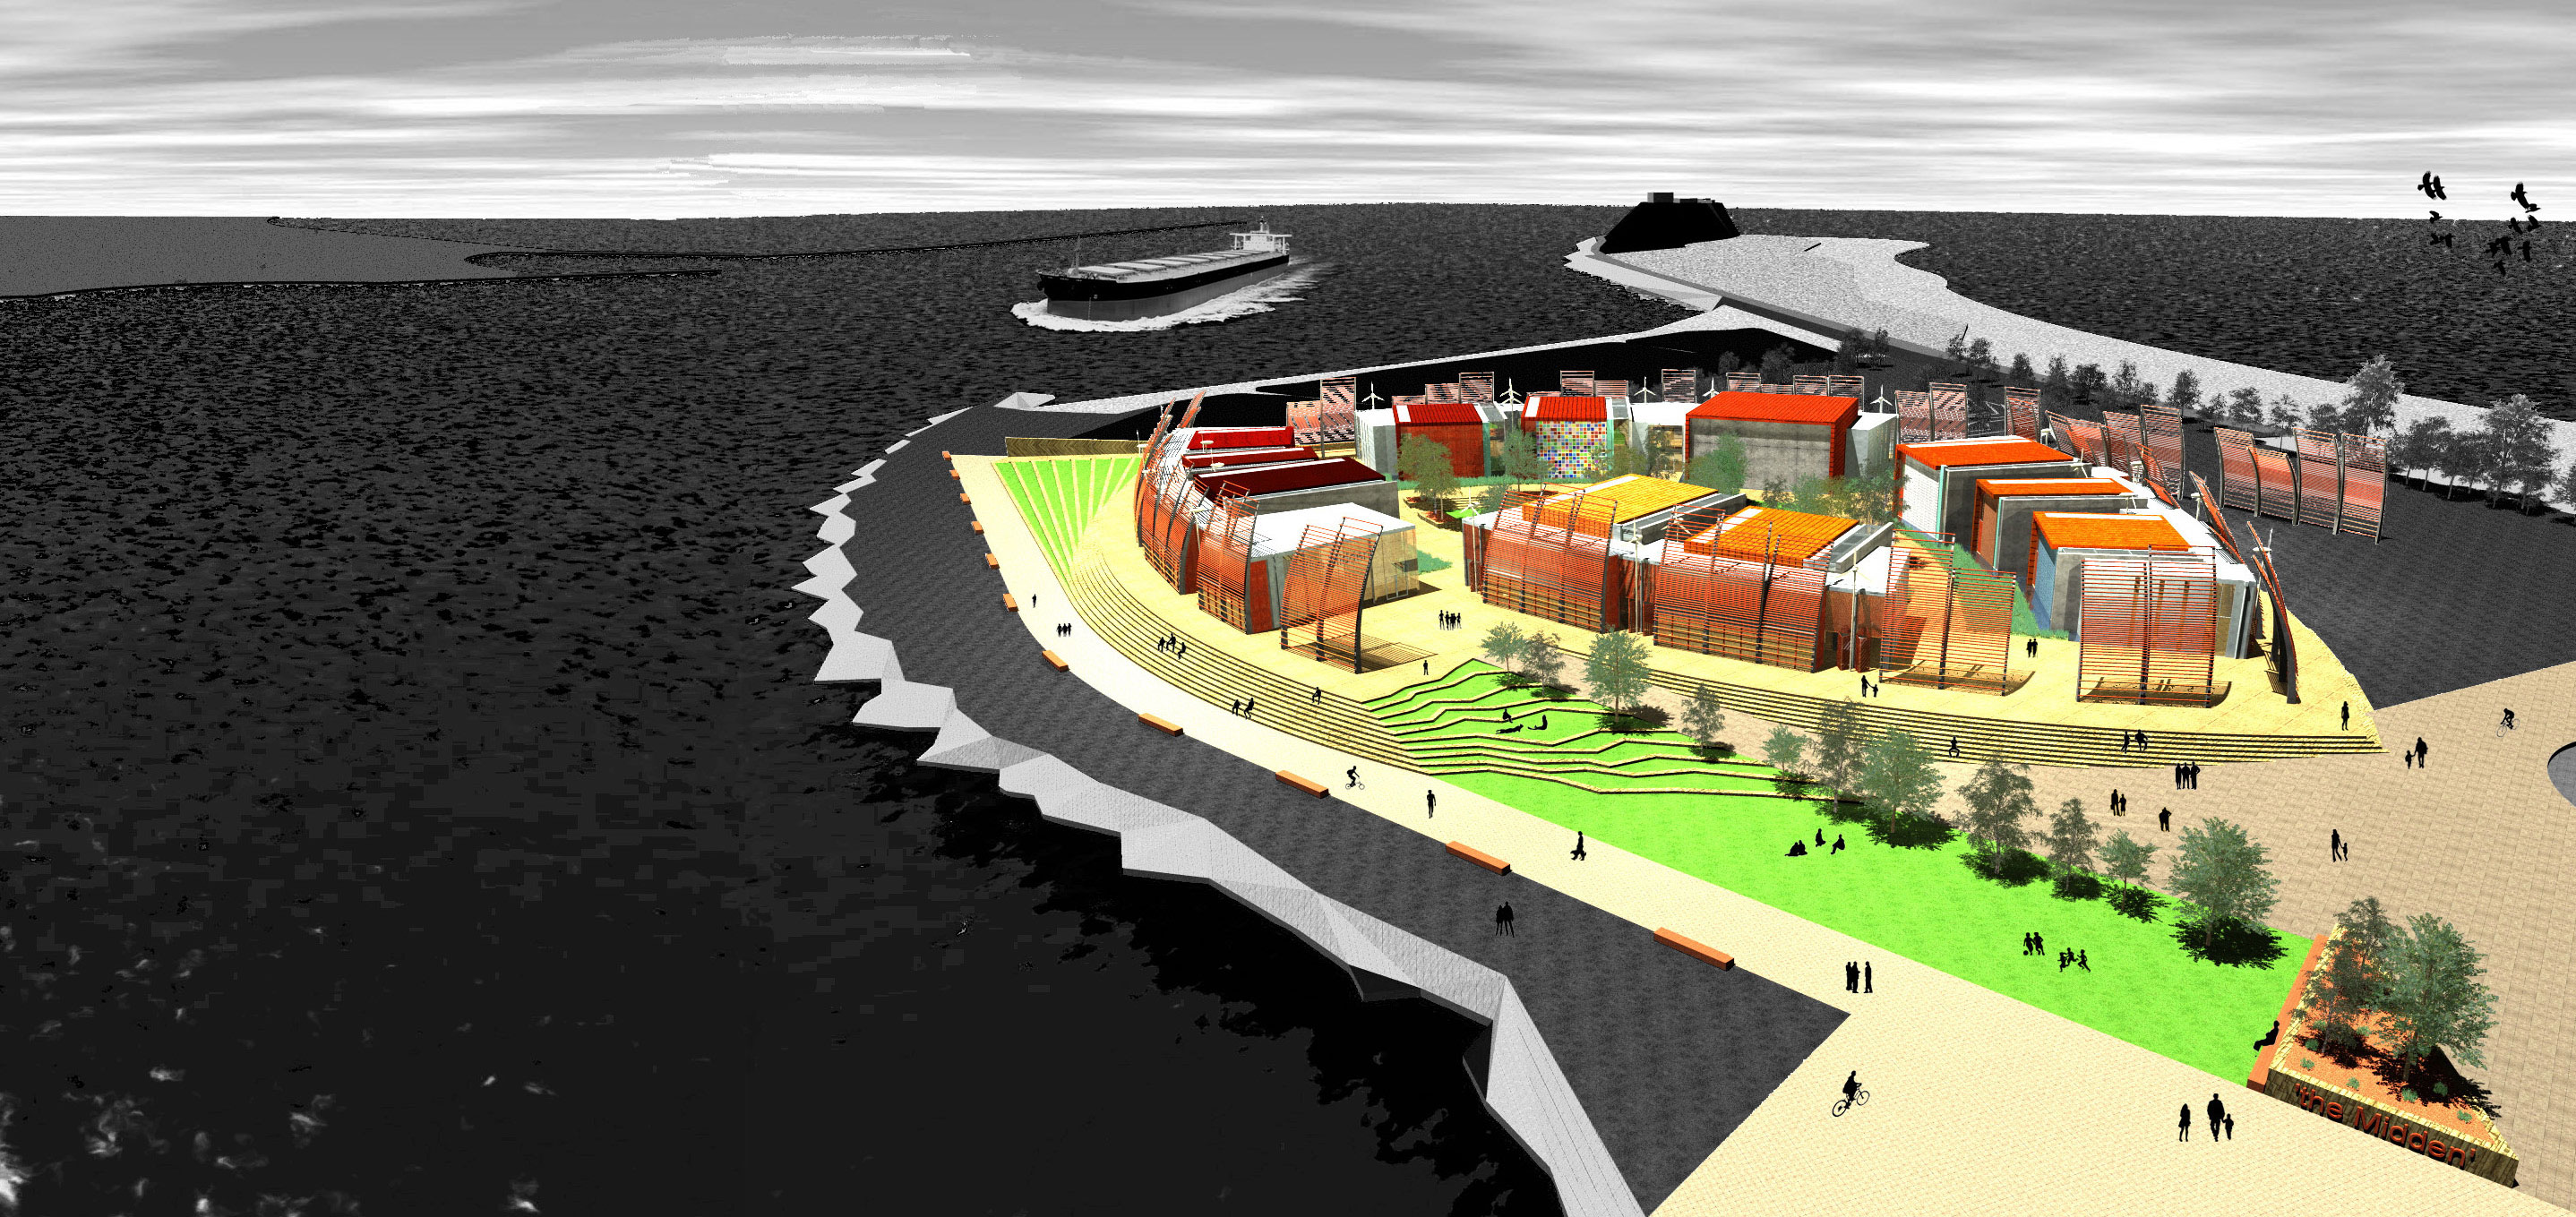 'The Midden' - Concept Design for Coal River Interpretative Centre by Andrew Cavill